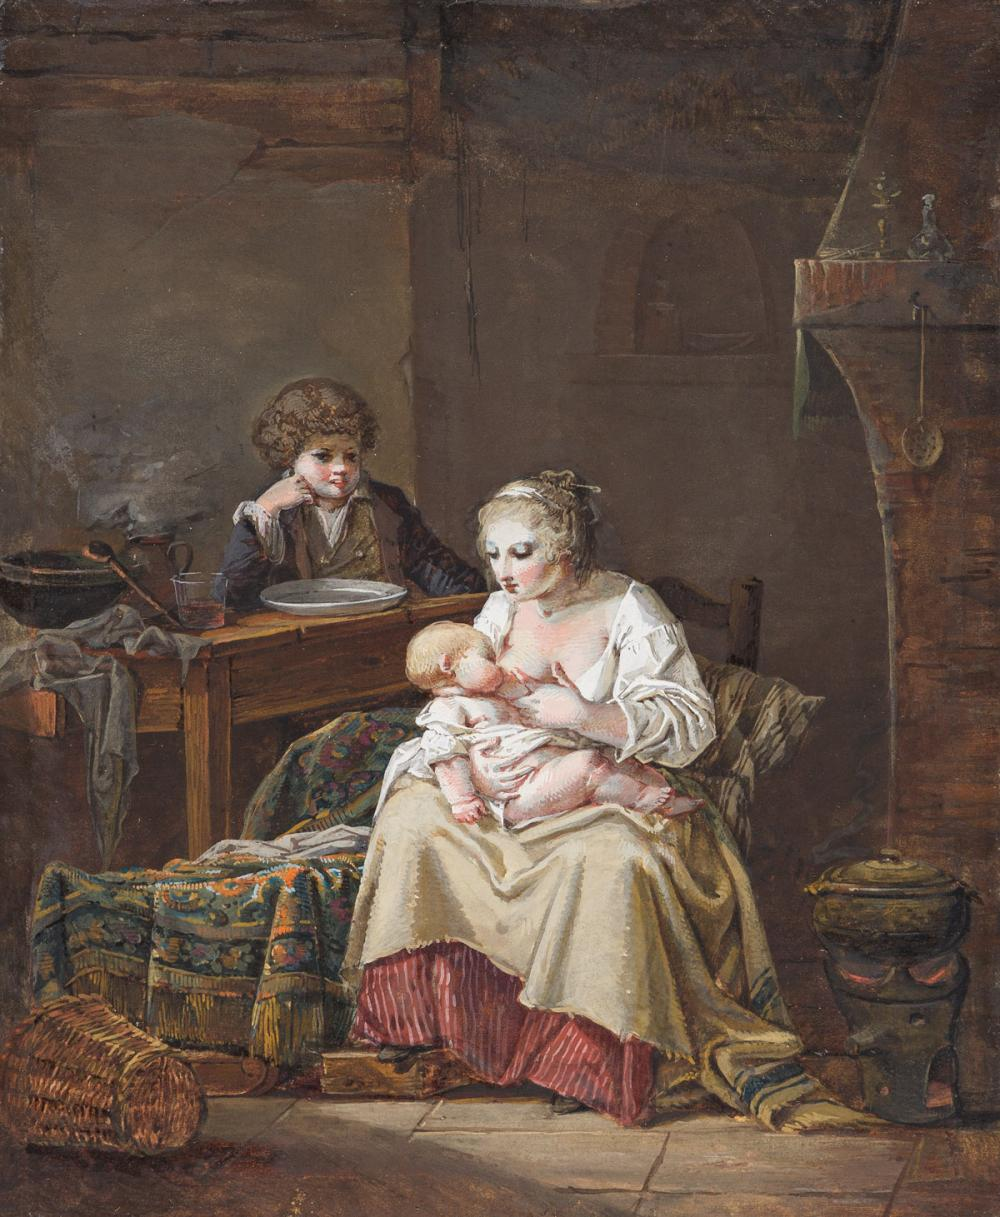 JEAN-BAPTISTE MALLET (Grasse 1759-1835 Paris) The Young Mother.